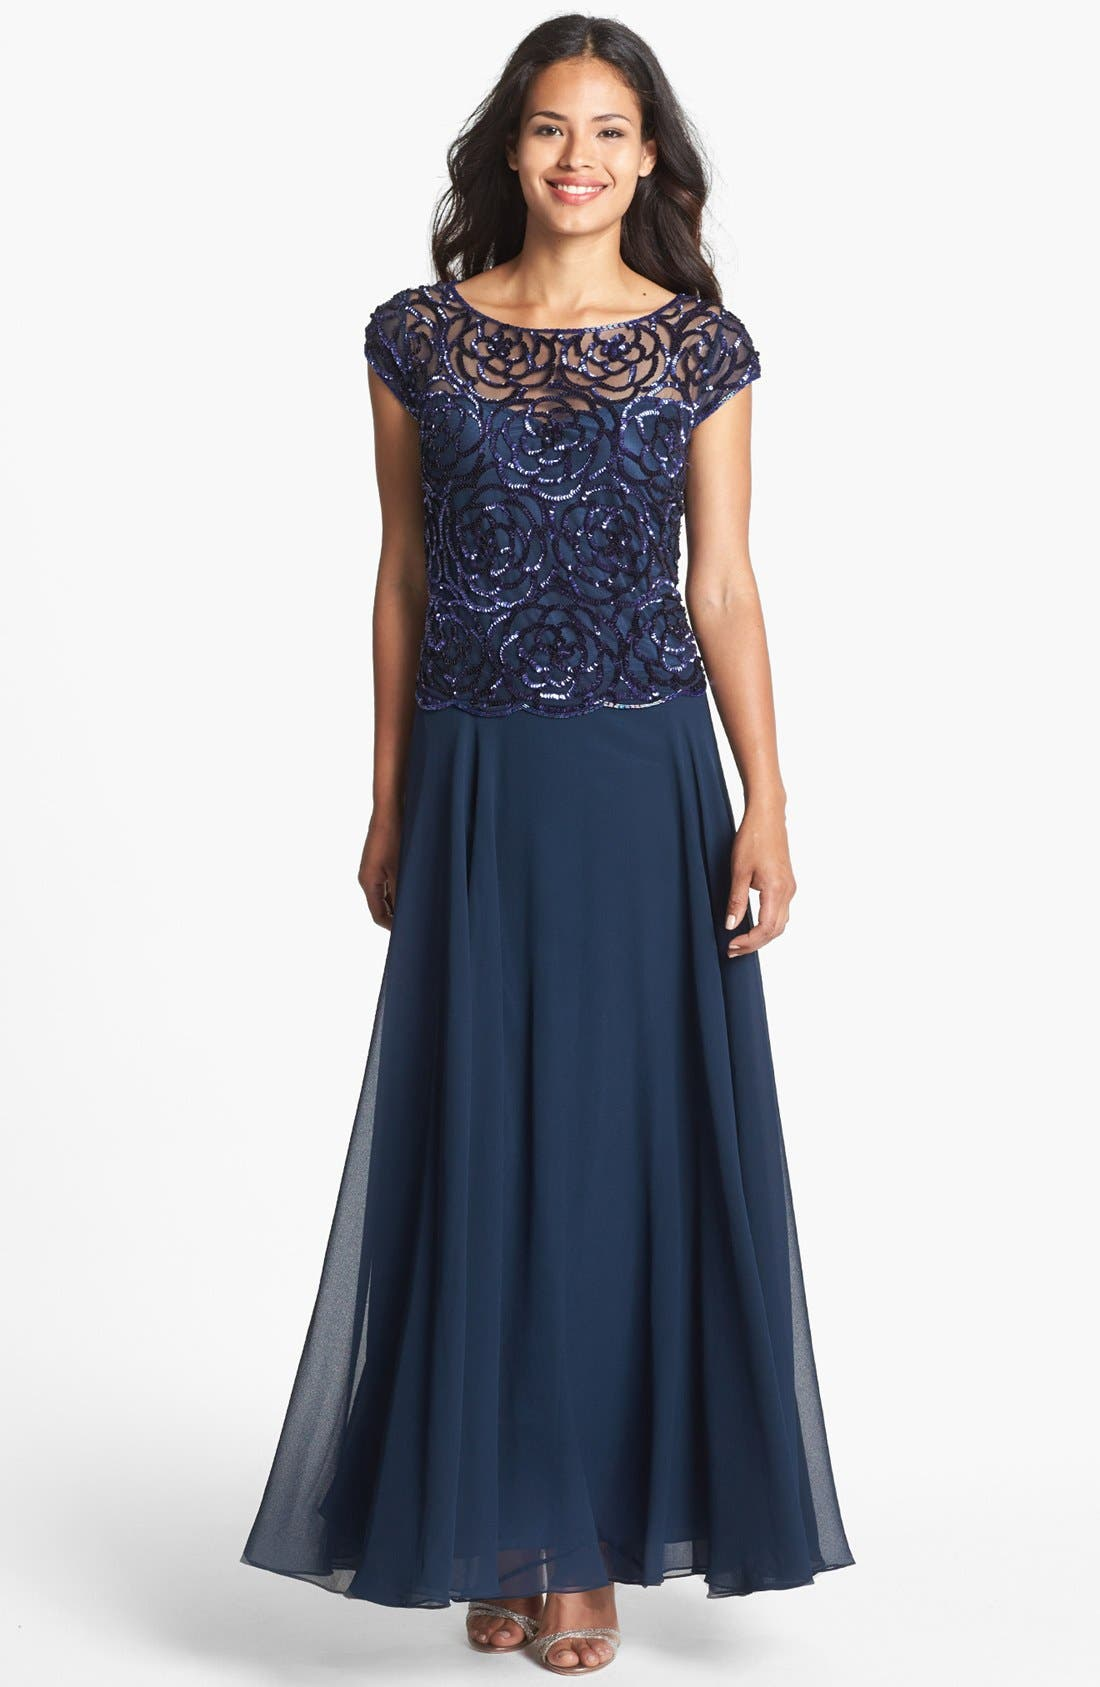 Alternate Image 1 Selected - J Kara Sequin Floral Cap Sleeve Gown